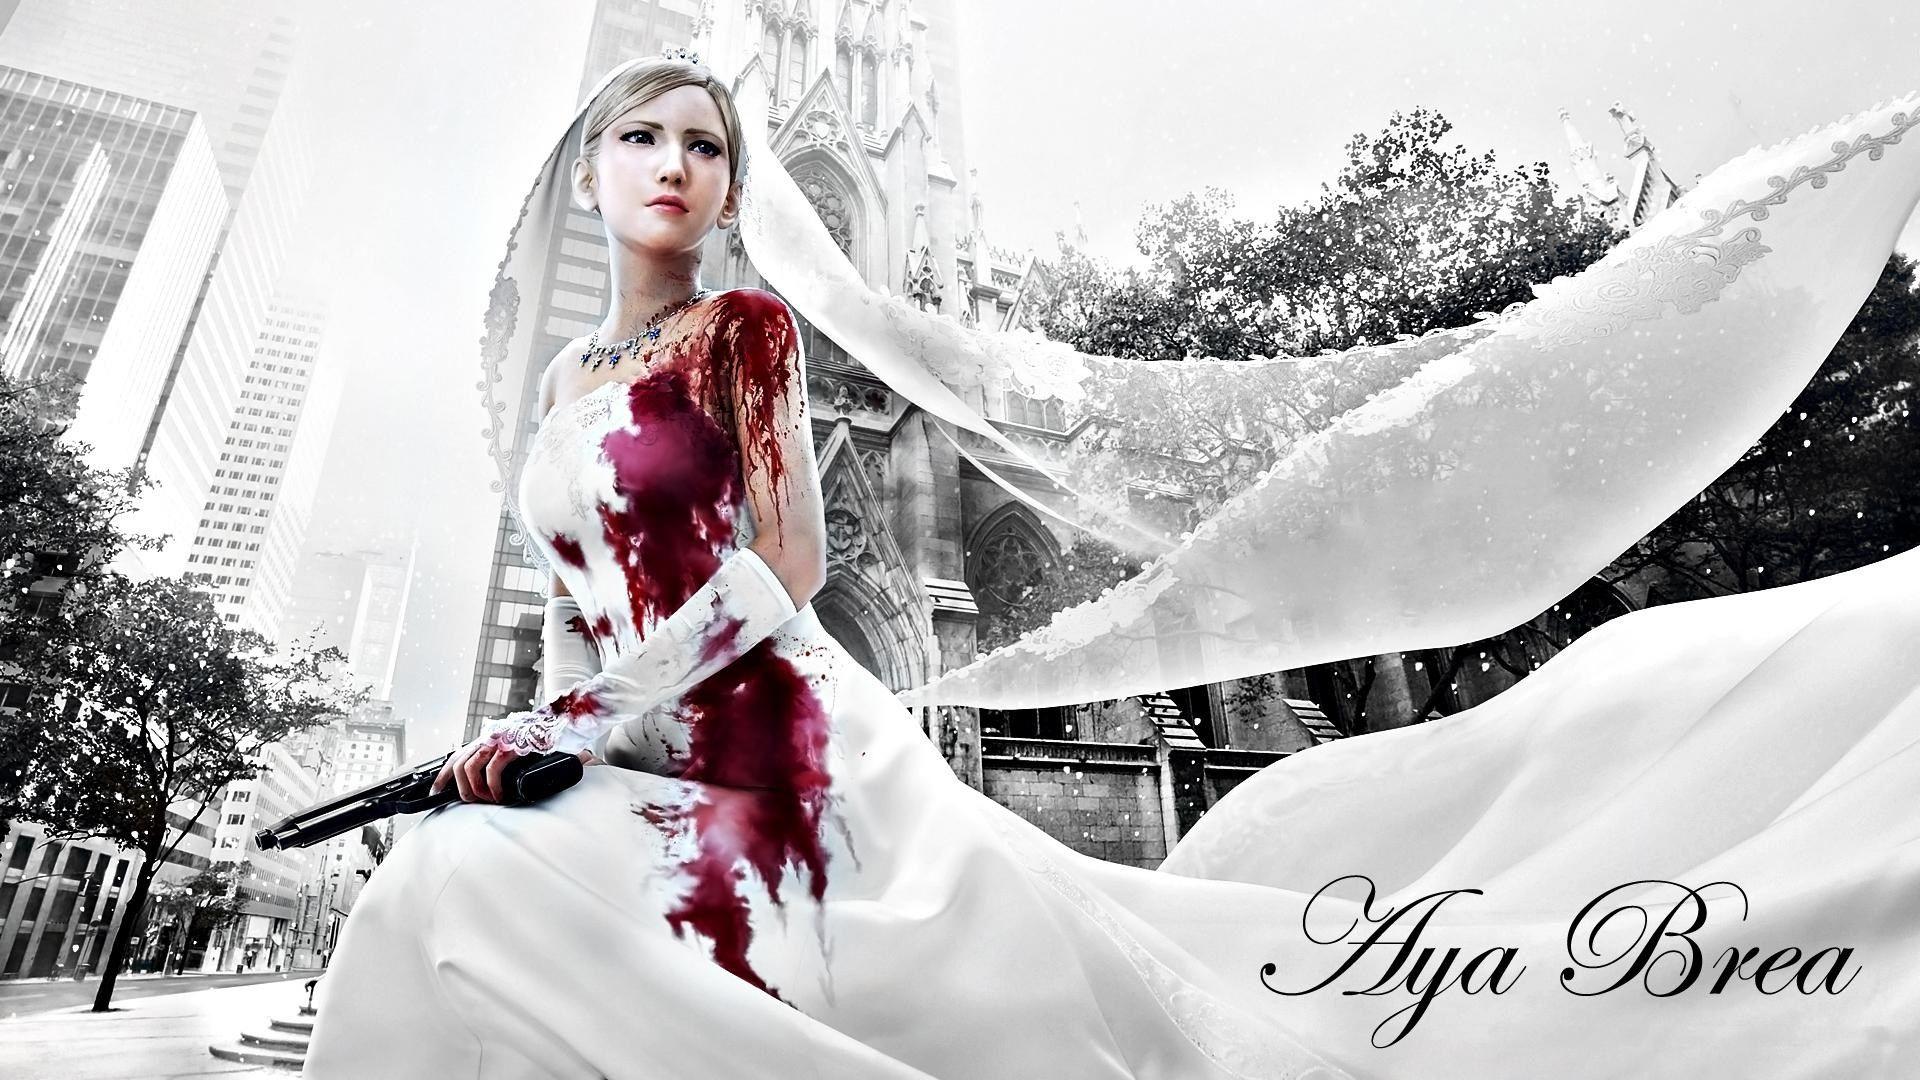 1920x1080 Free Computer Wallpaper For Parasite Eve Wedding Artwork Wedding Dresses Wedding Art